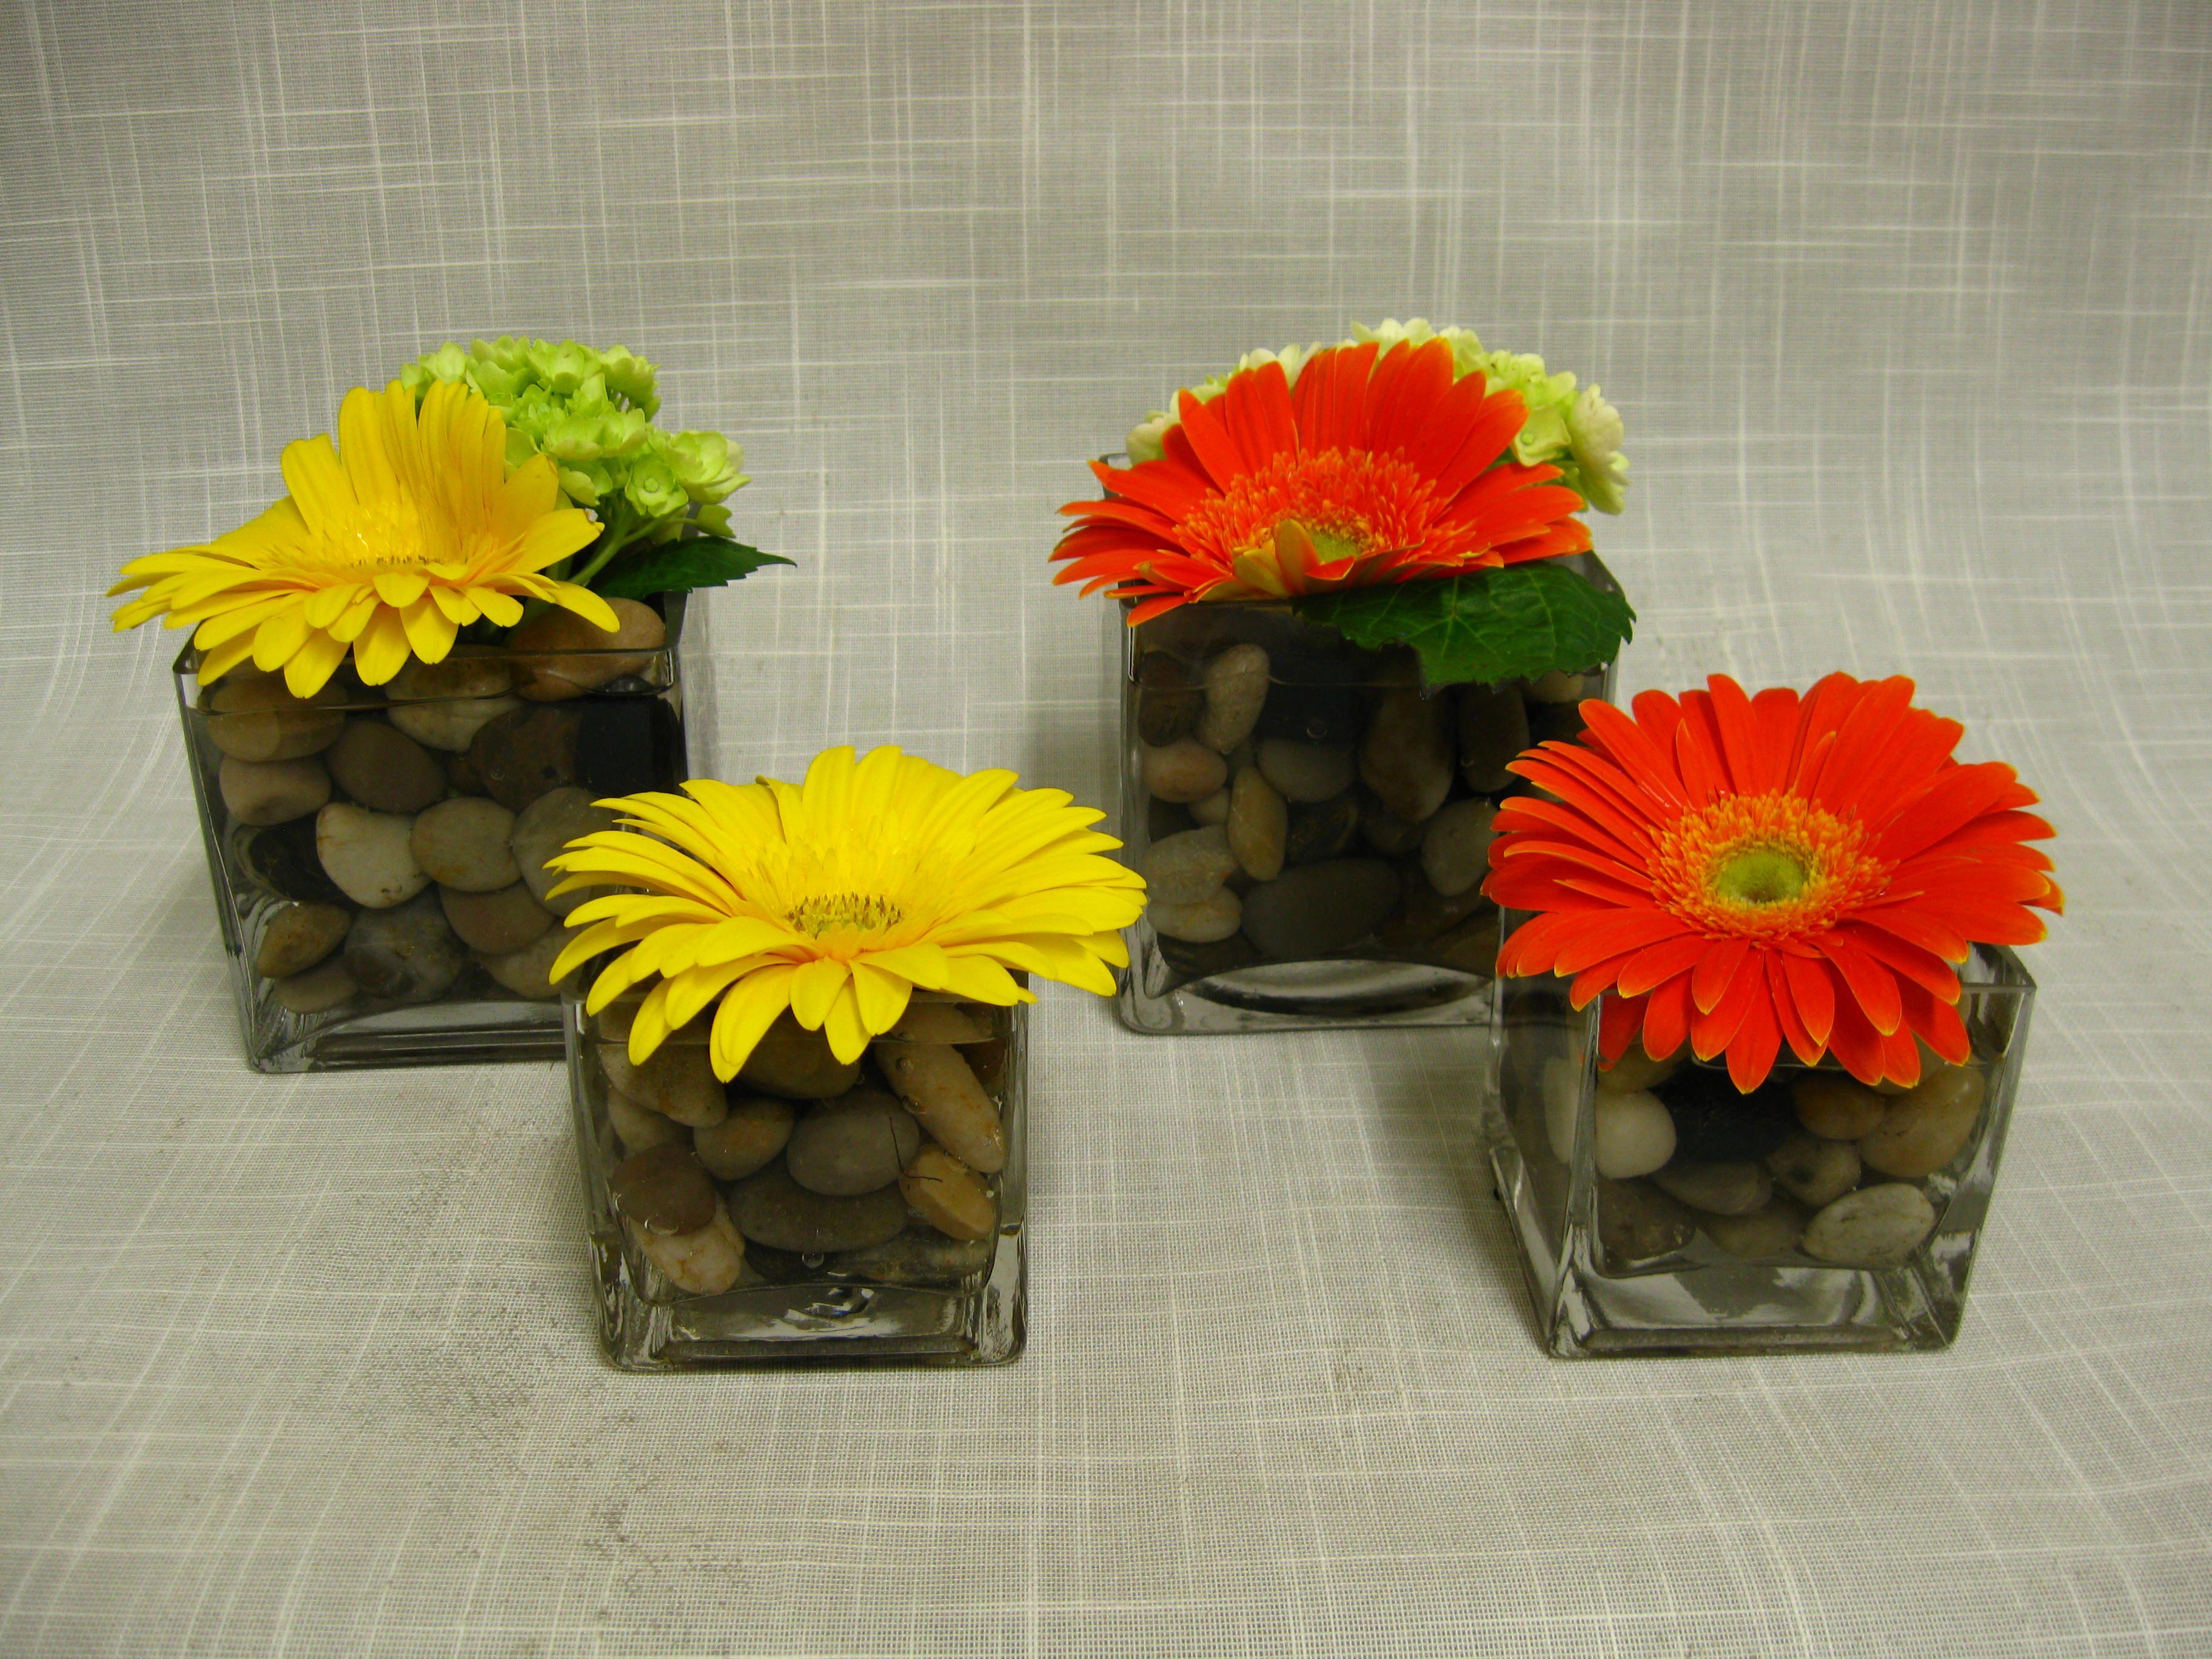 Gerbera daisy centerpieces our wedding centerpieces pinterest gerbera daisy centerpieces izmirmasajfo